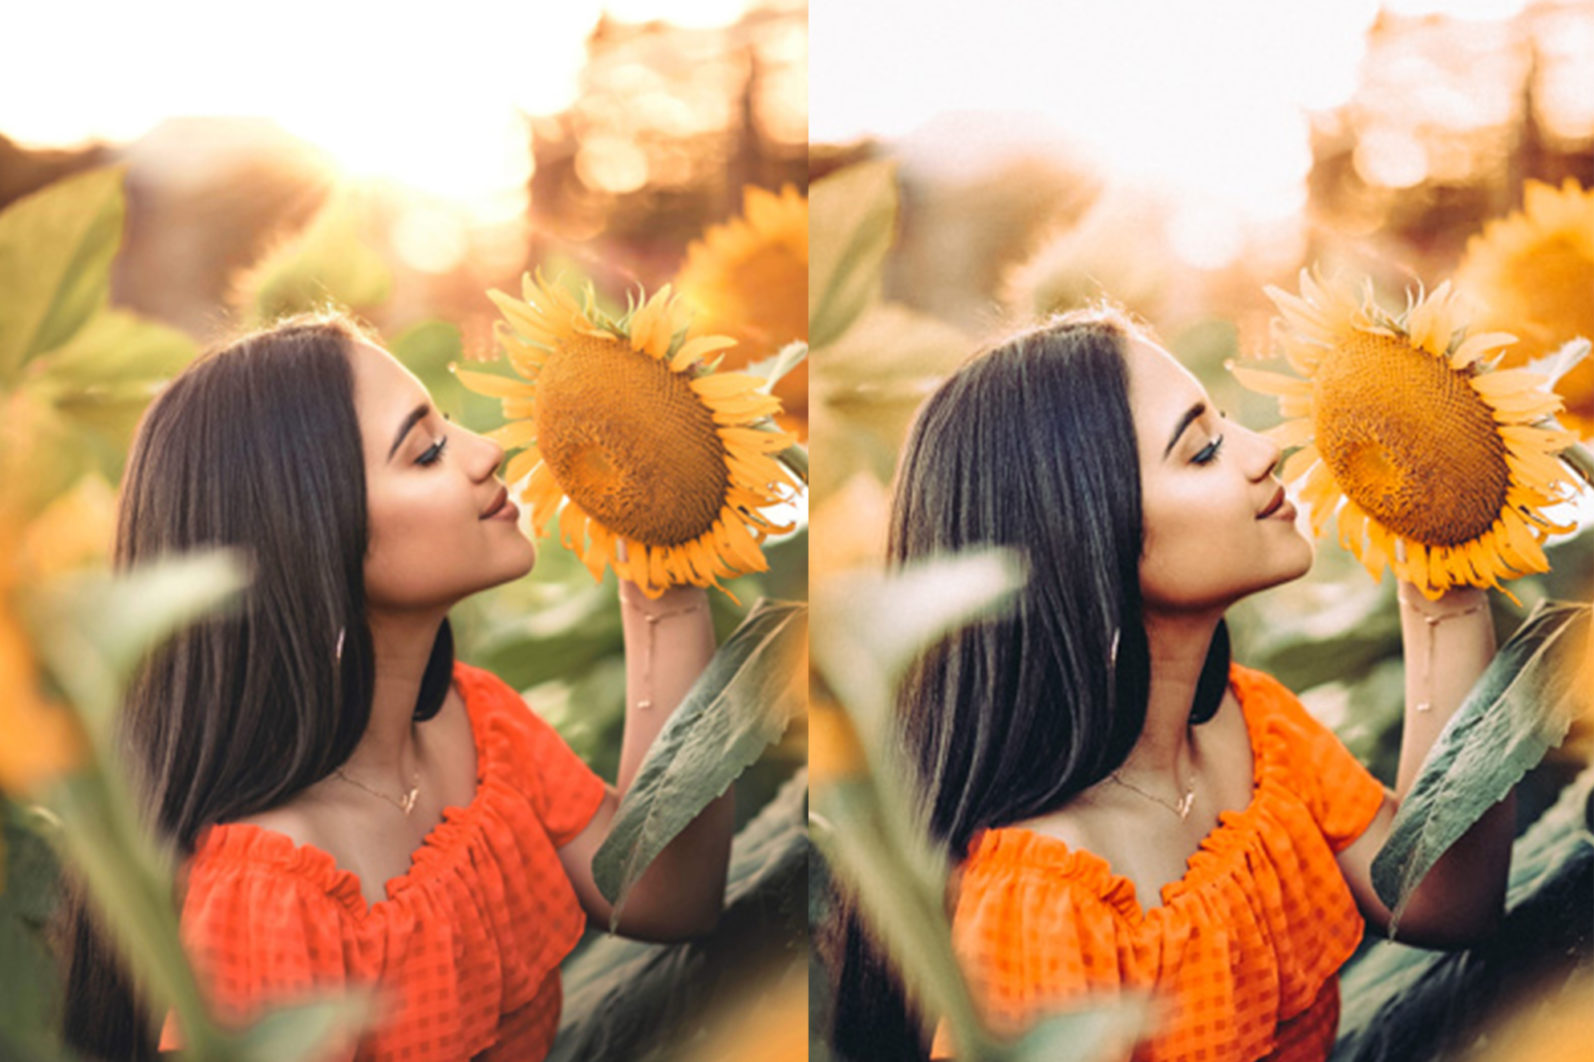 12 x Sunflower Fields Lightroom Presets   Warm Lightroom Presets   Yellow Presets - 3 Sunflower Fields -